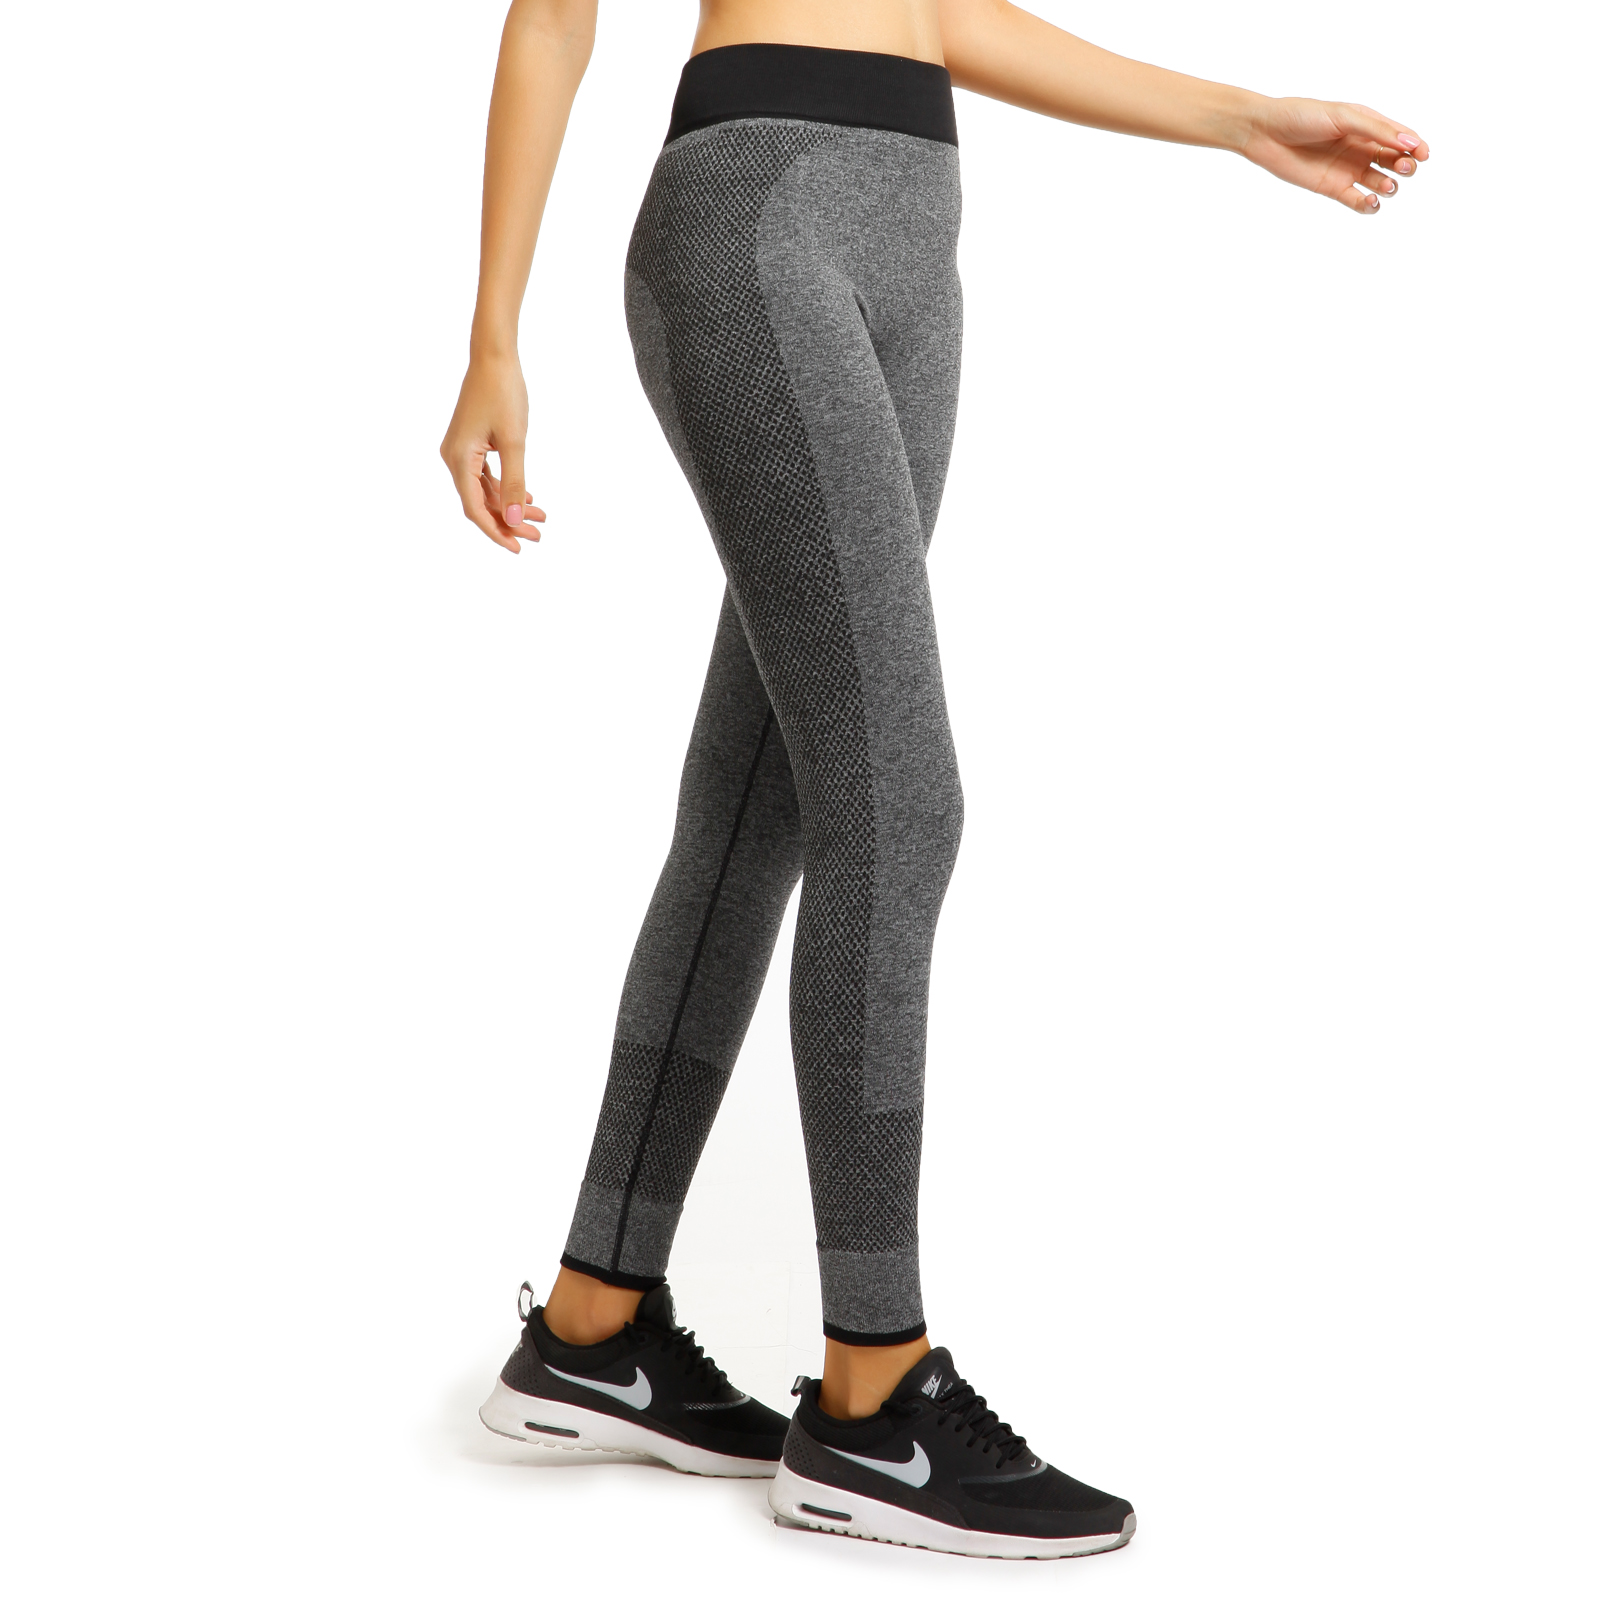 Fitness Leggings Amazon Uk: Womens Push-Up Sport Yoga Running Pants Fitness Gym